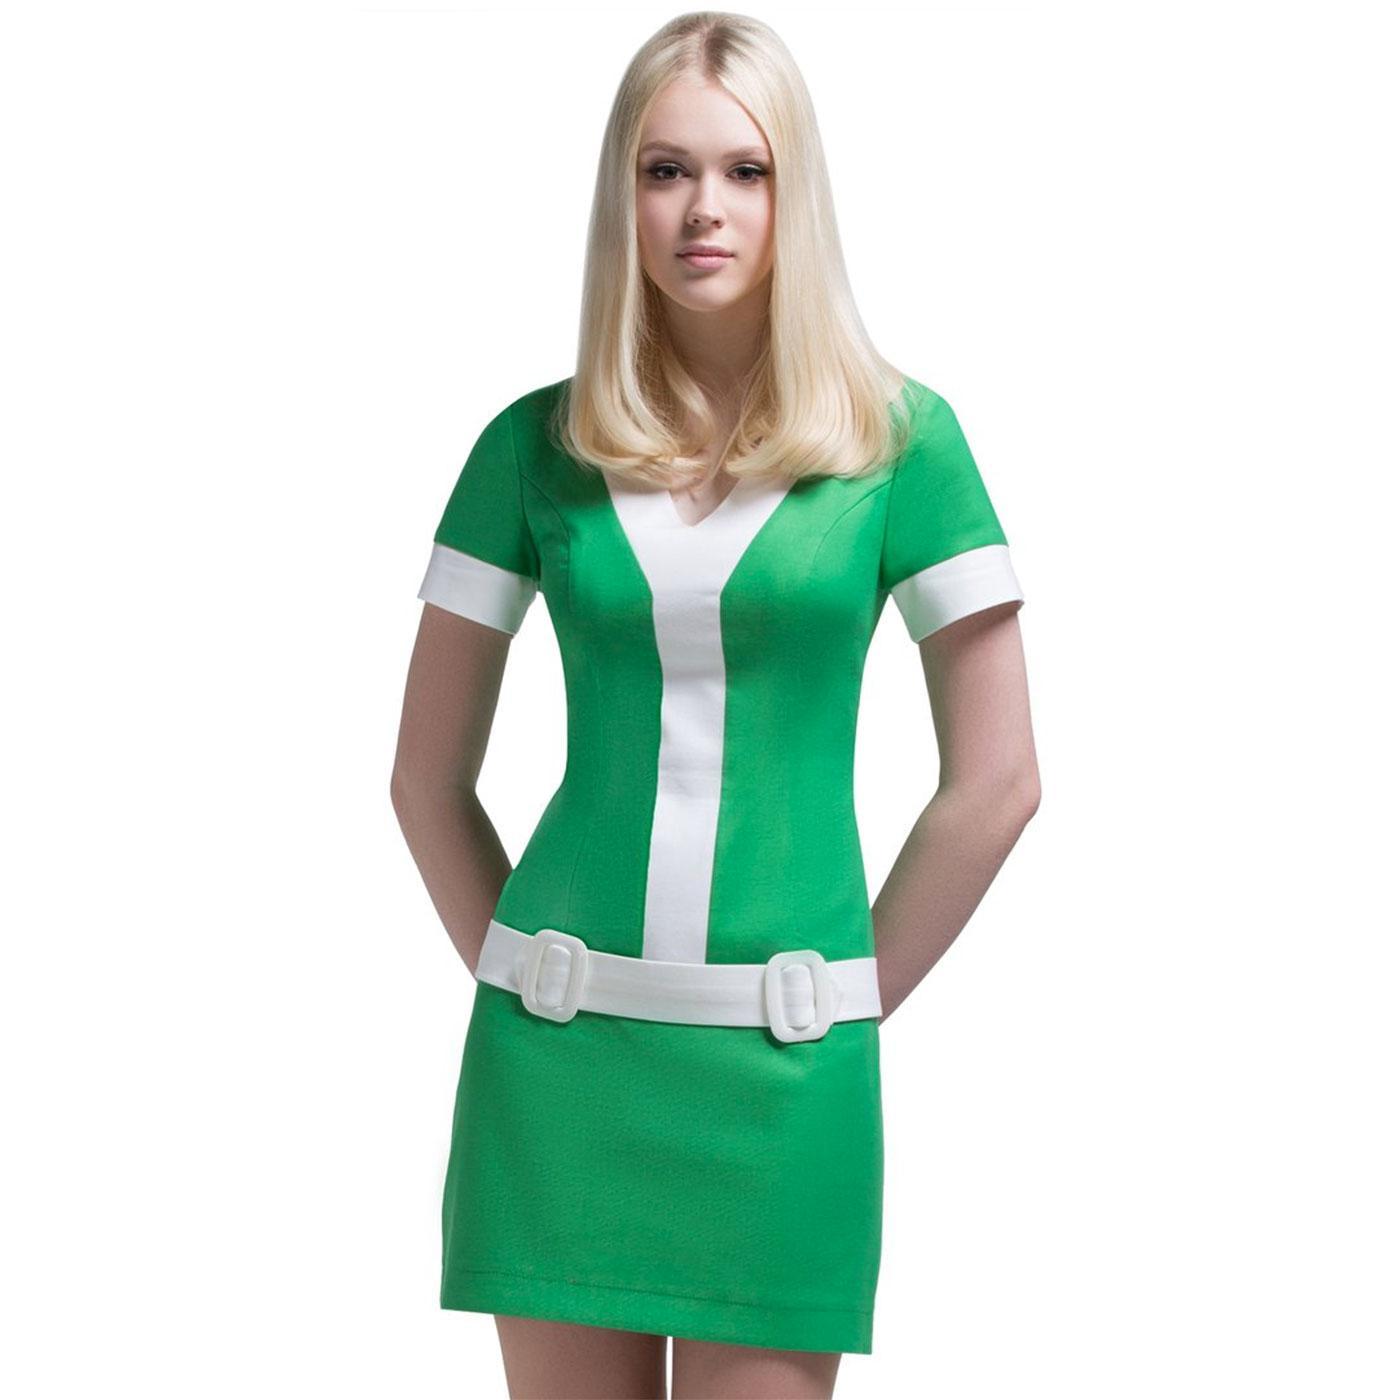 MARMALADE Retro 60s Short Sleeve Mod Dress Green